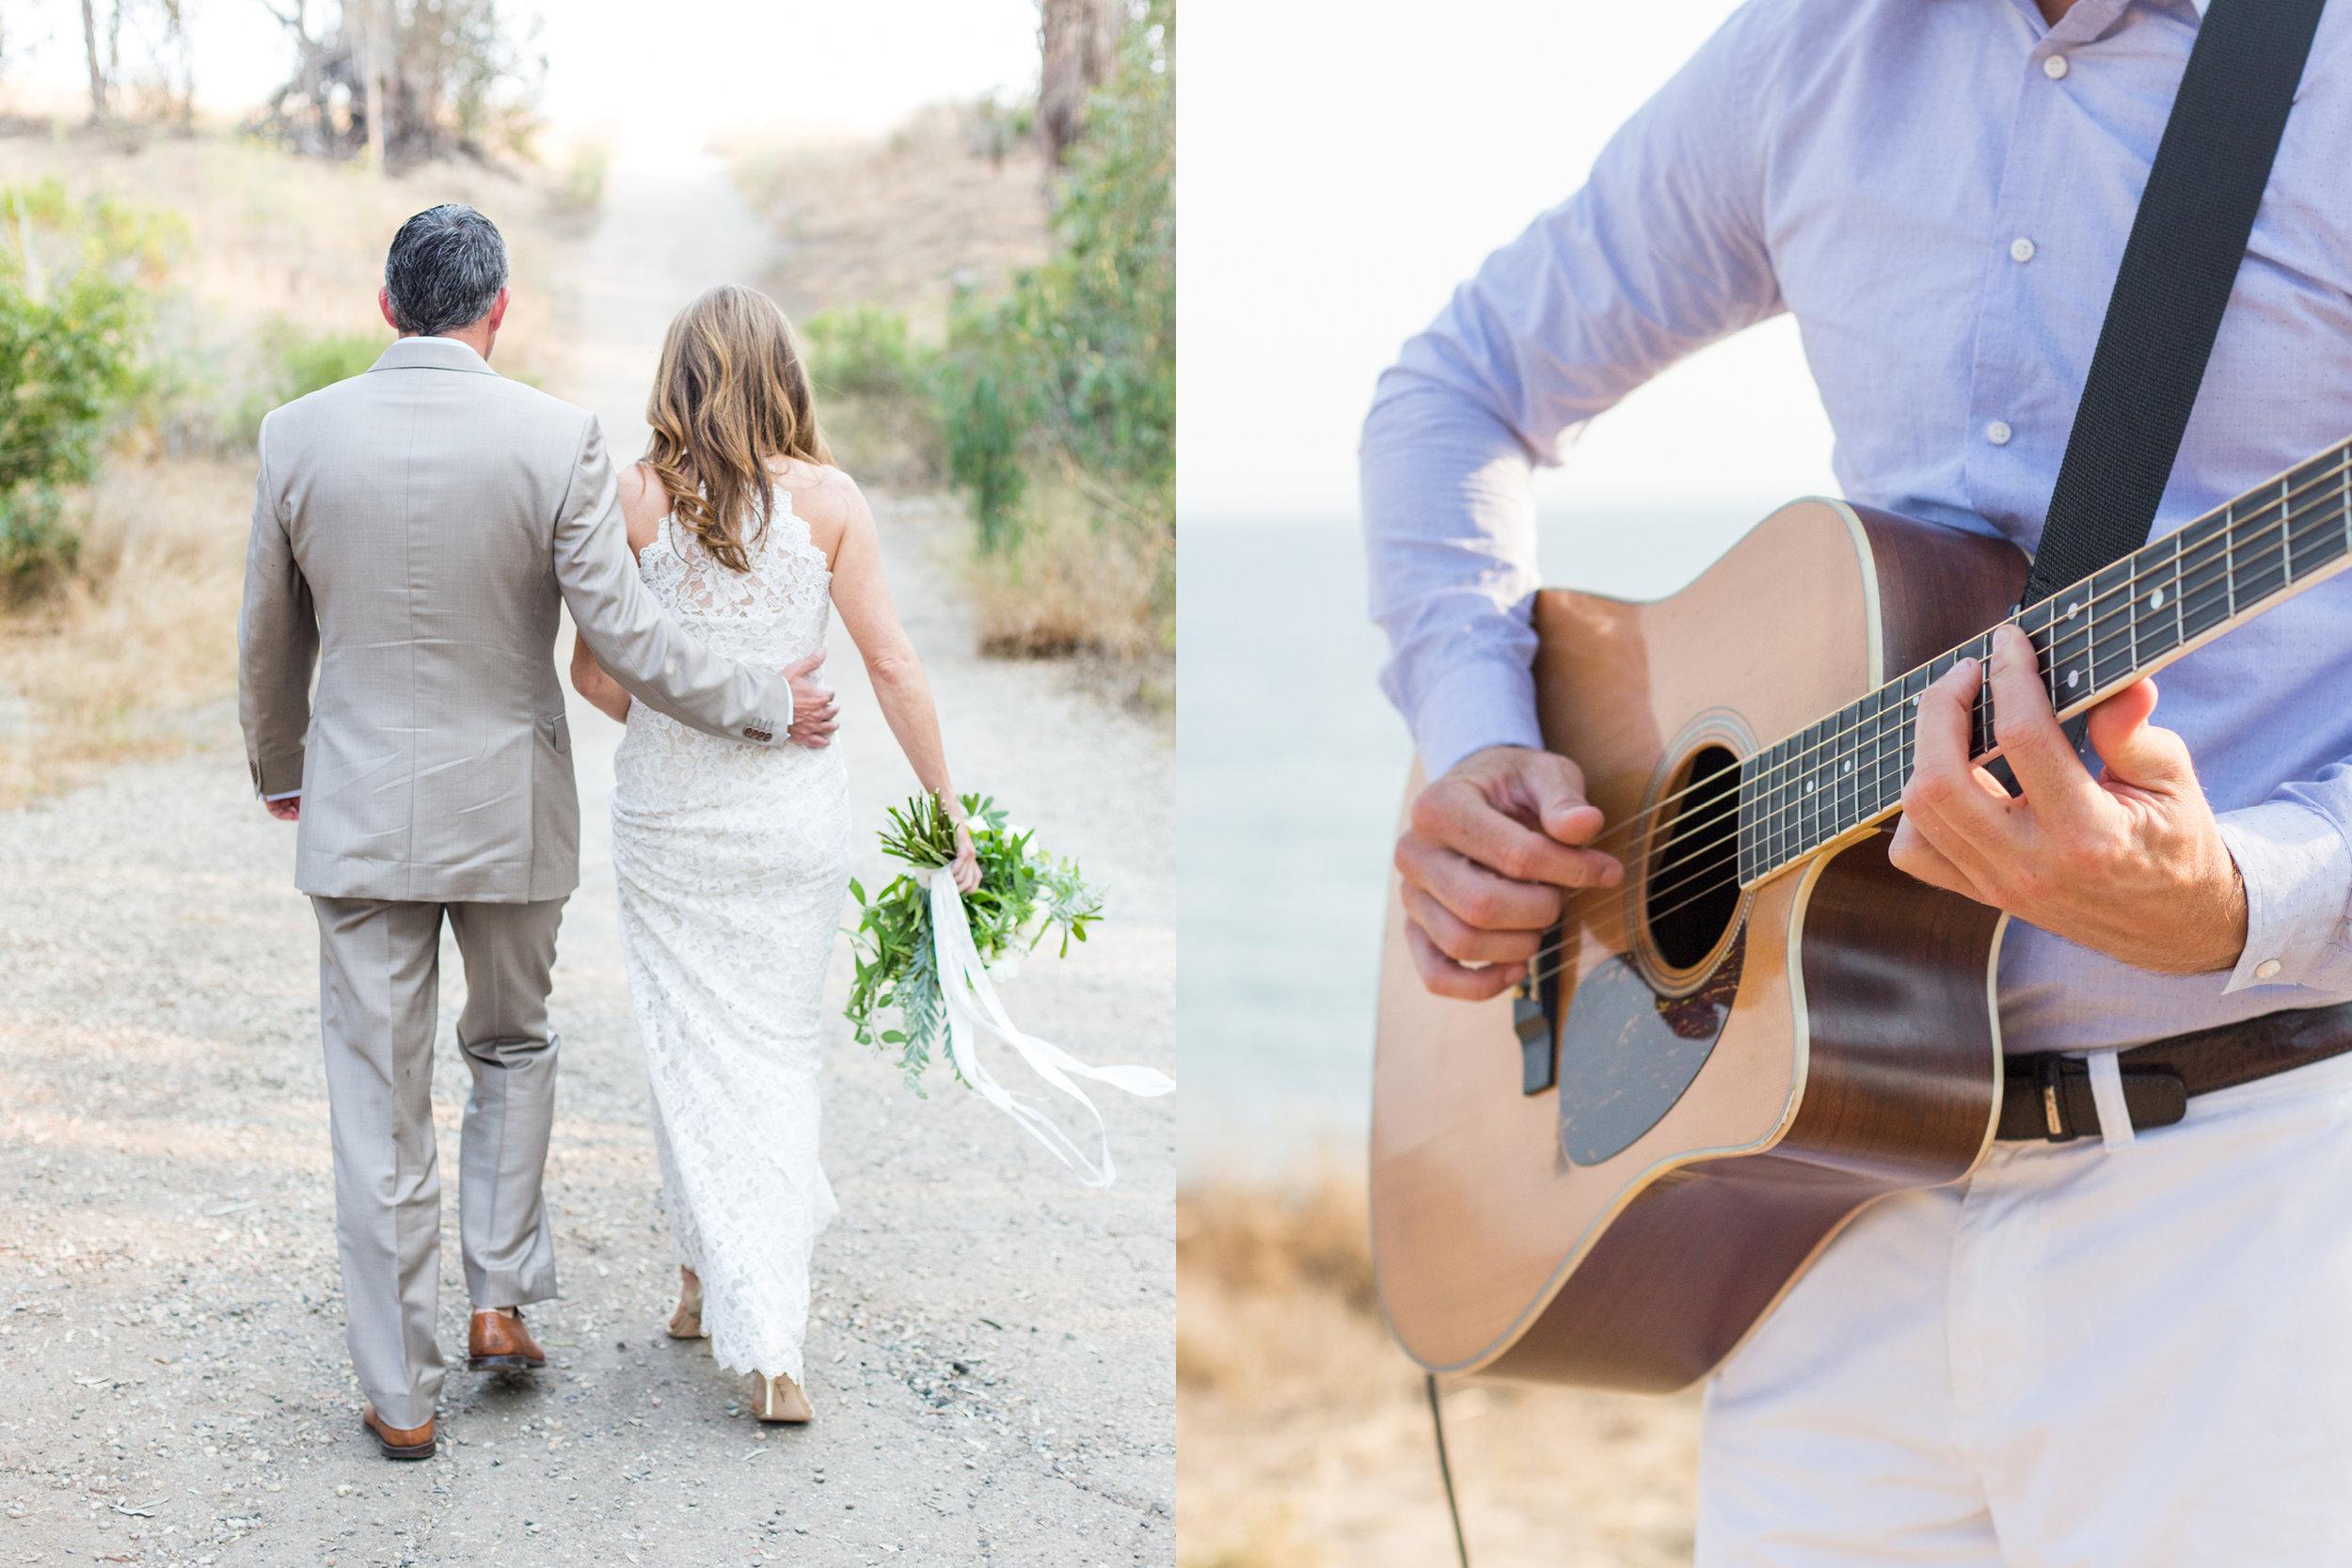 santa-barbara-elopement-elope-wedding-planner-coordinator-coordination-day-of-intimate-rustic-ellwood-bluffs-forest-beach-ocean-view-green-white-event (6).jpg